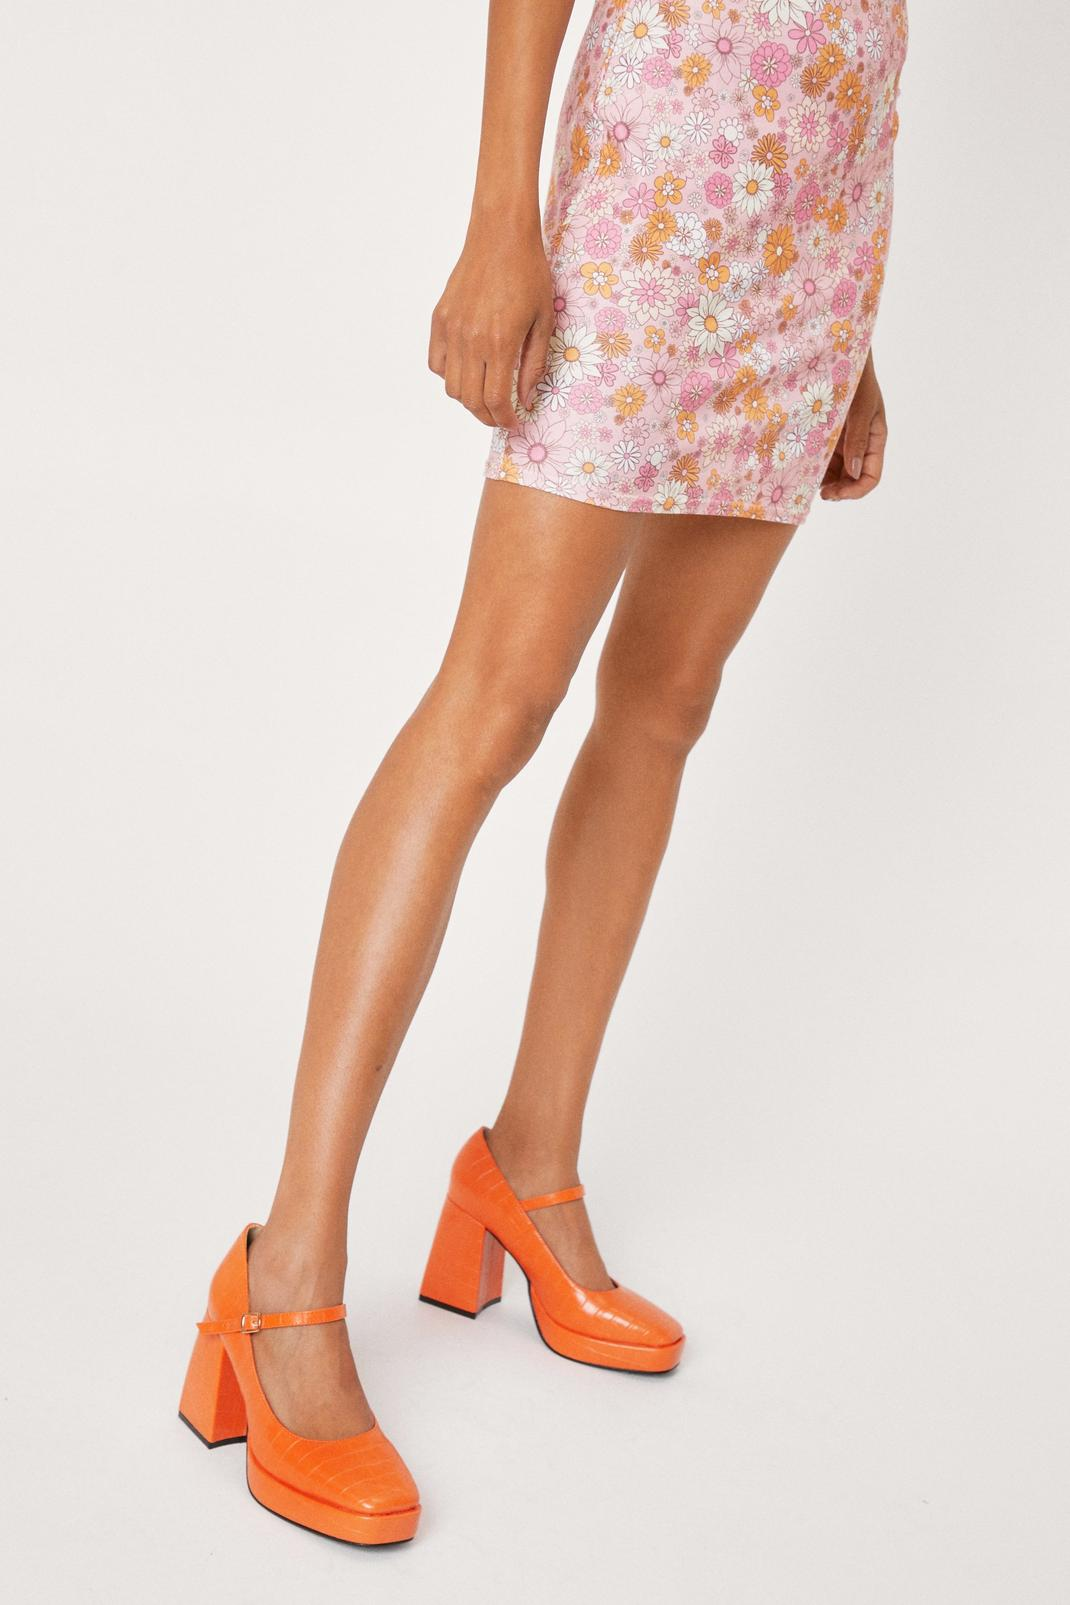 Croc Faux Leather Mary Jane Platform Heels | Nasty Gal